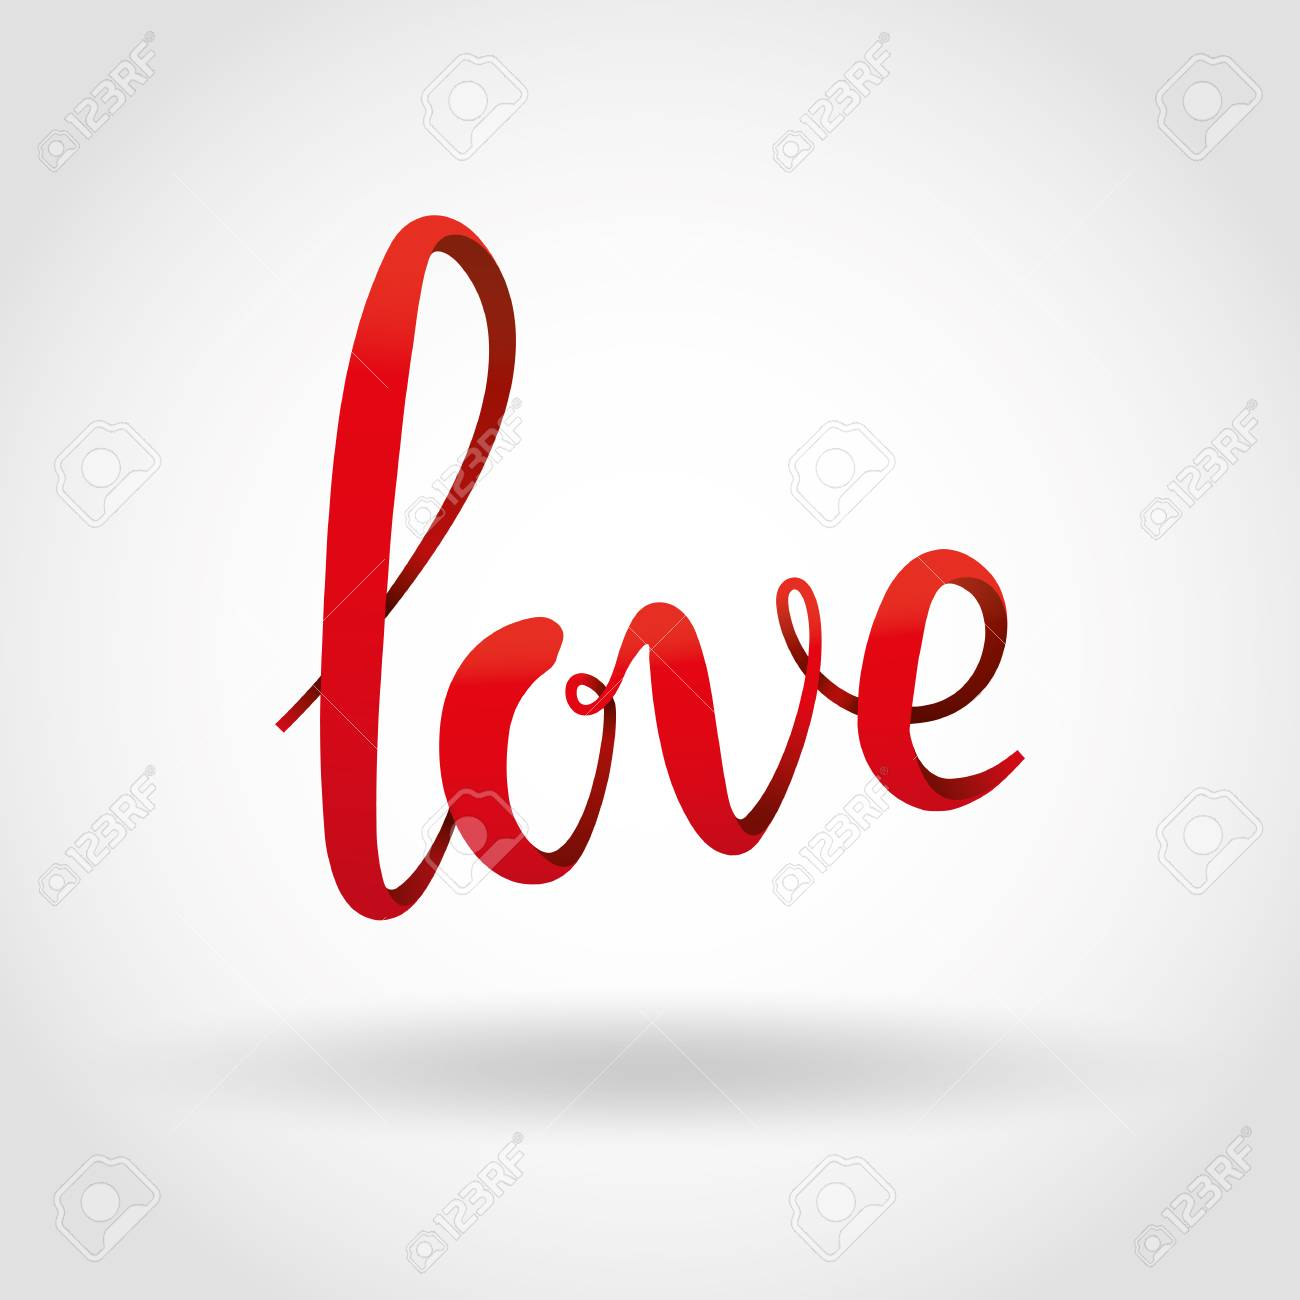 Love red 3d lettering background. Love volume script logotype for card, invitation, banner